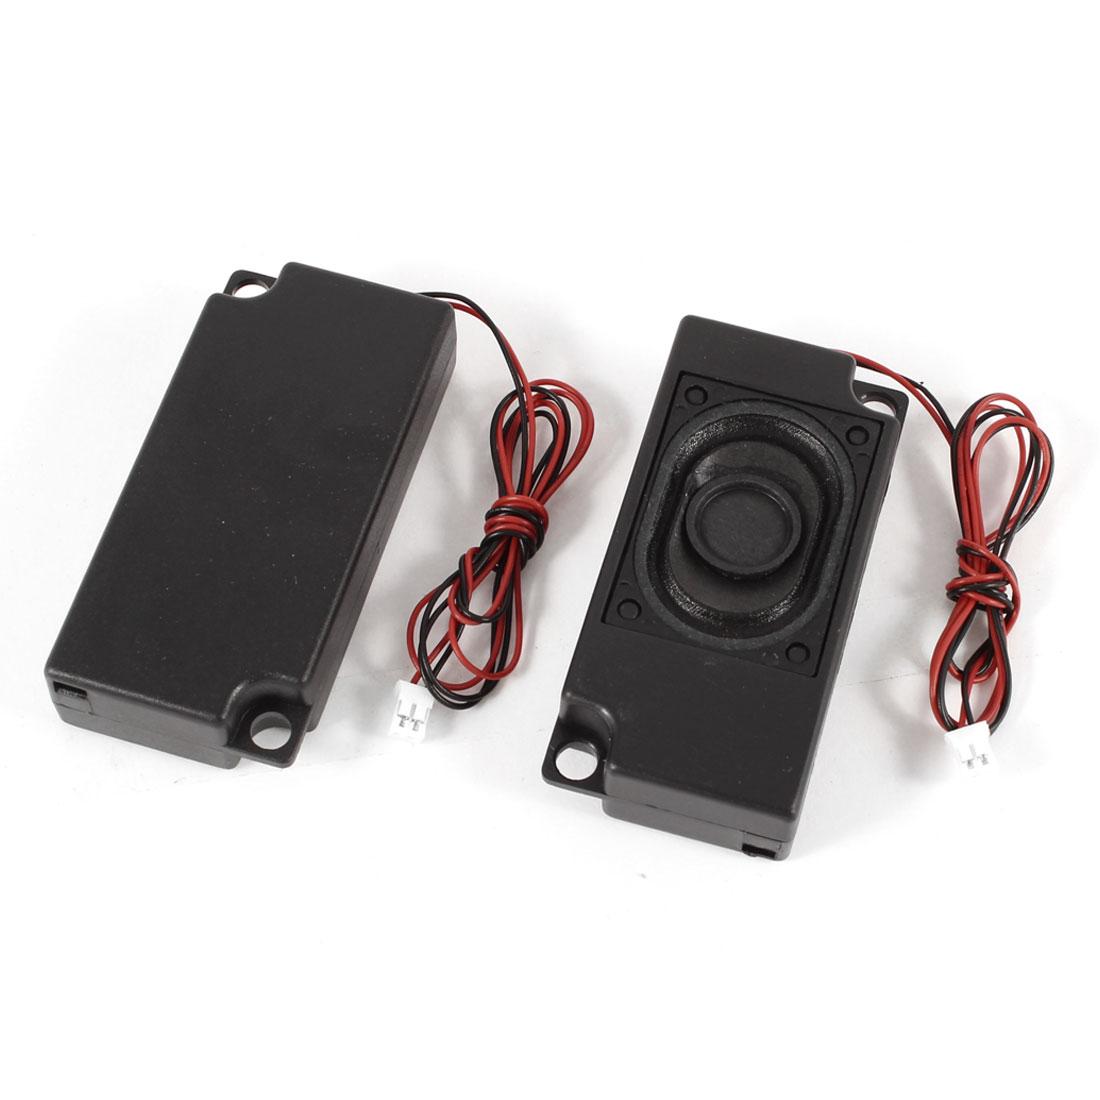 2pcs 60mm x 33mm Plastic Shell 2-Leads Audio Speaker Black 8 Ohm 2W